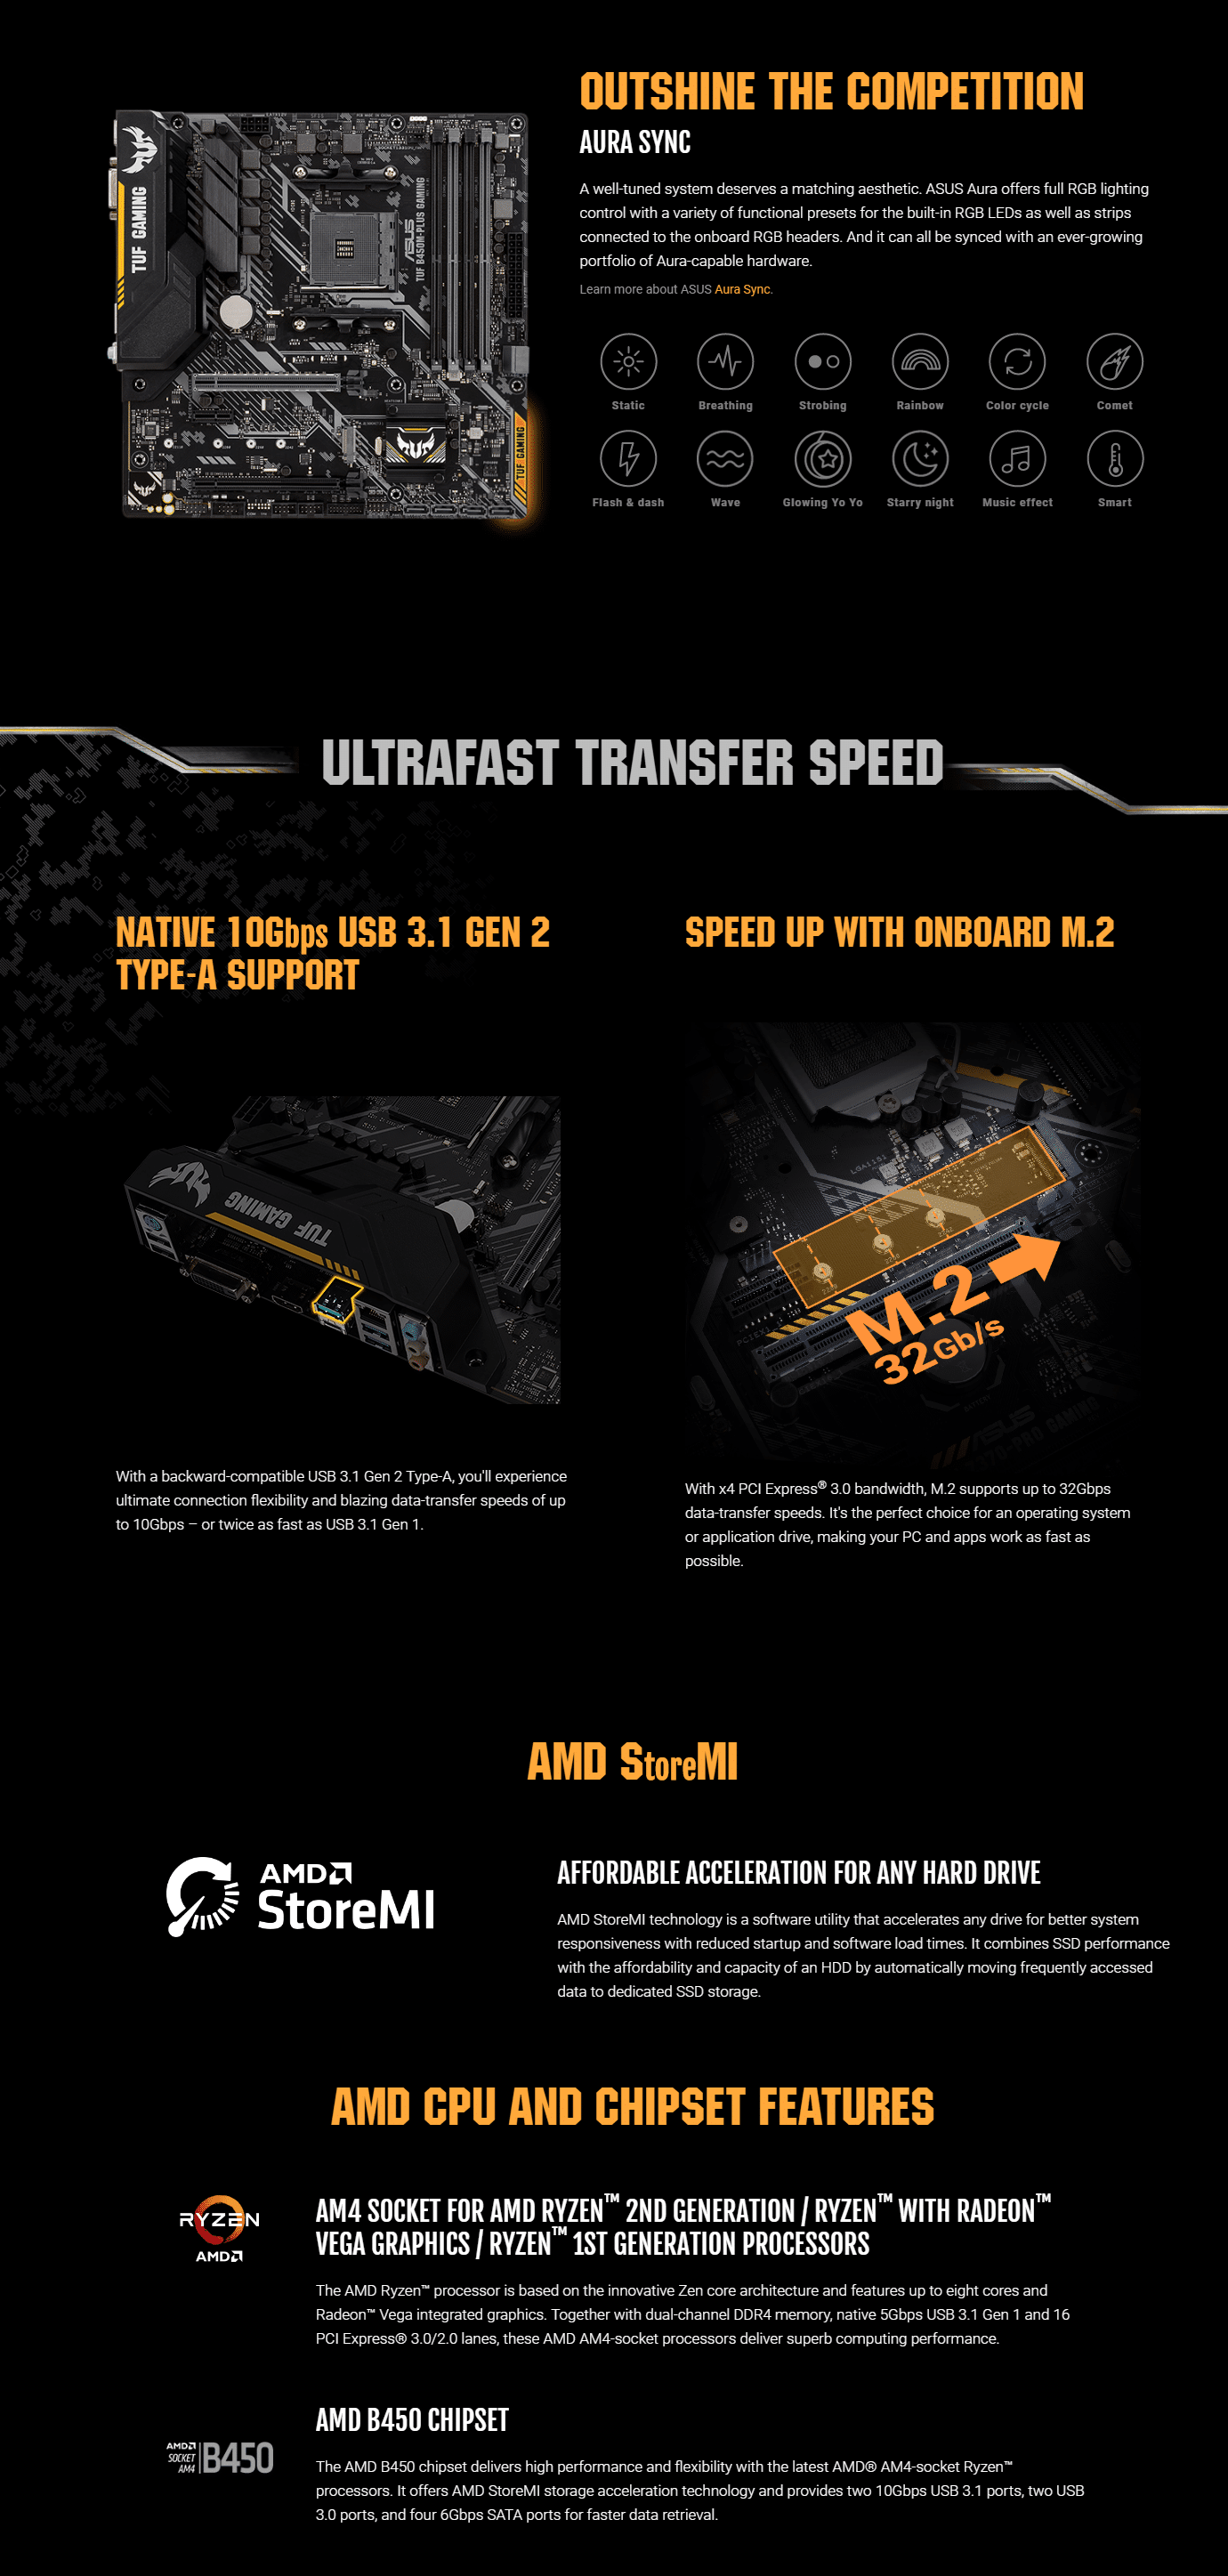 Asus TUF B450M-PLUS Gaming AMD B450 Ryzen Socket AM4 Micro-ATX Desktop Motherboard